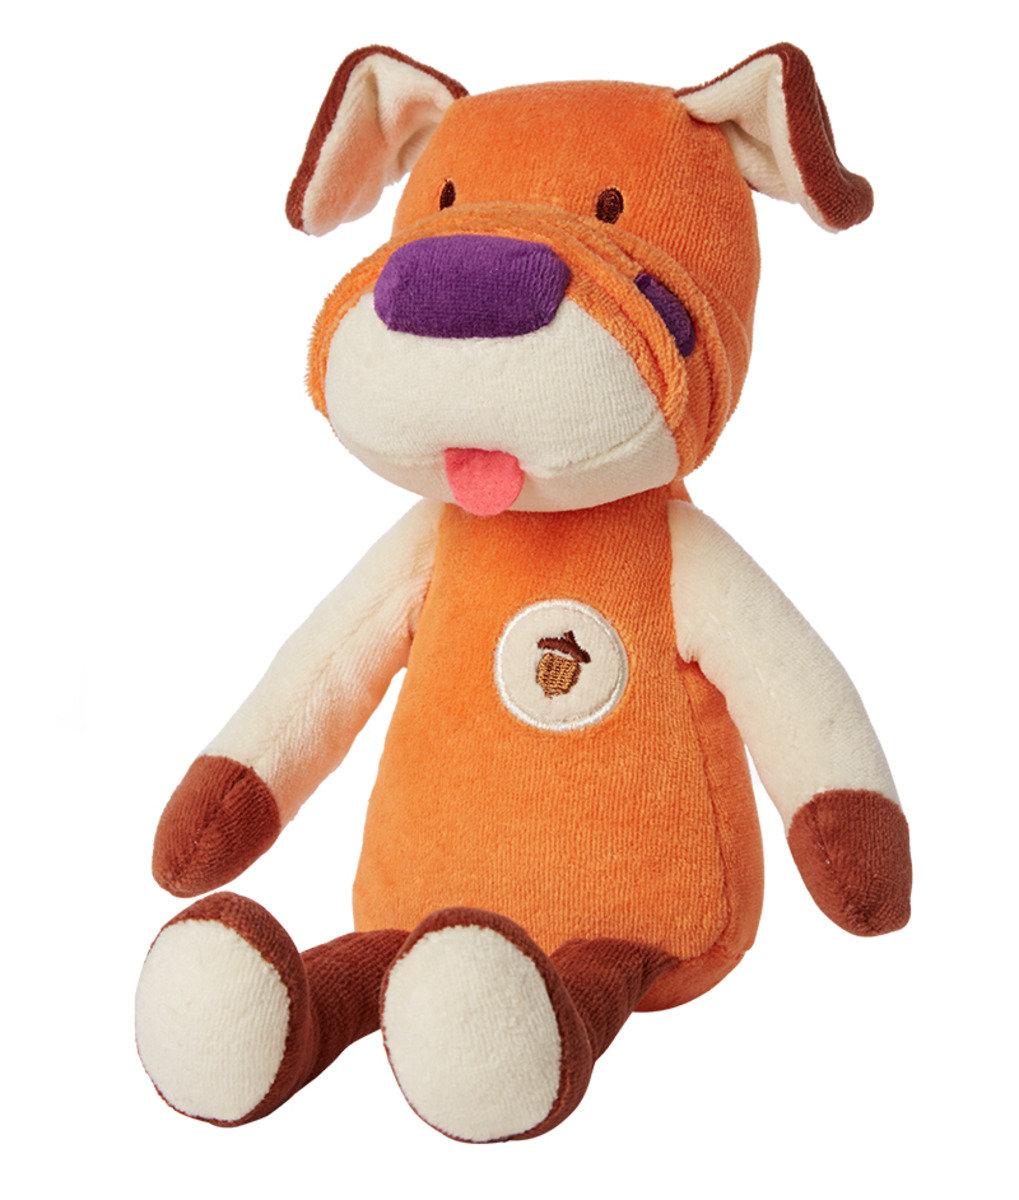 Plush Collection天然有機棉公仔 - 橘色小狗